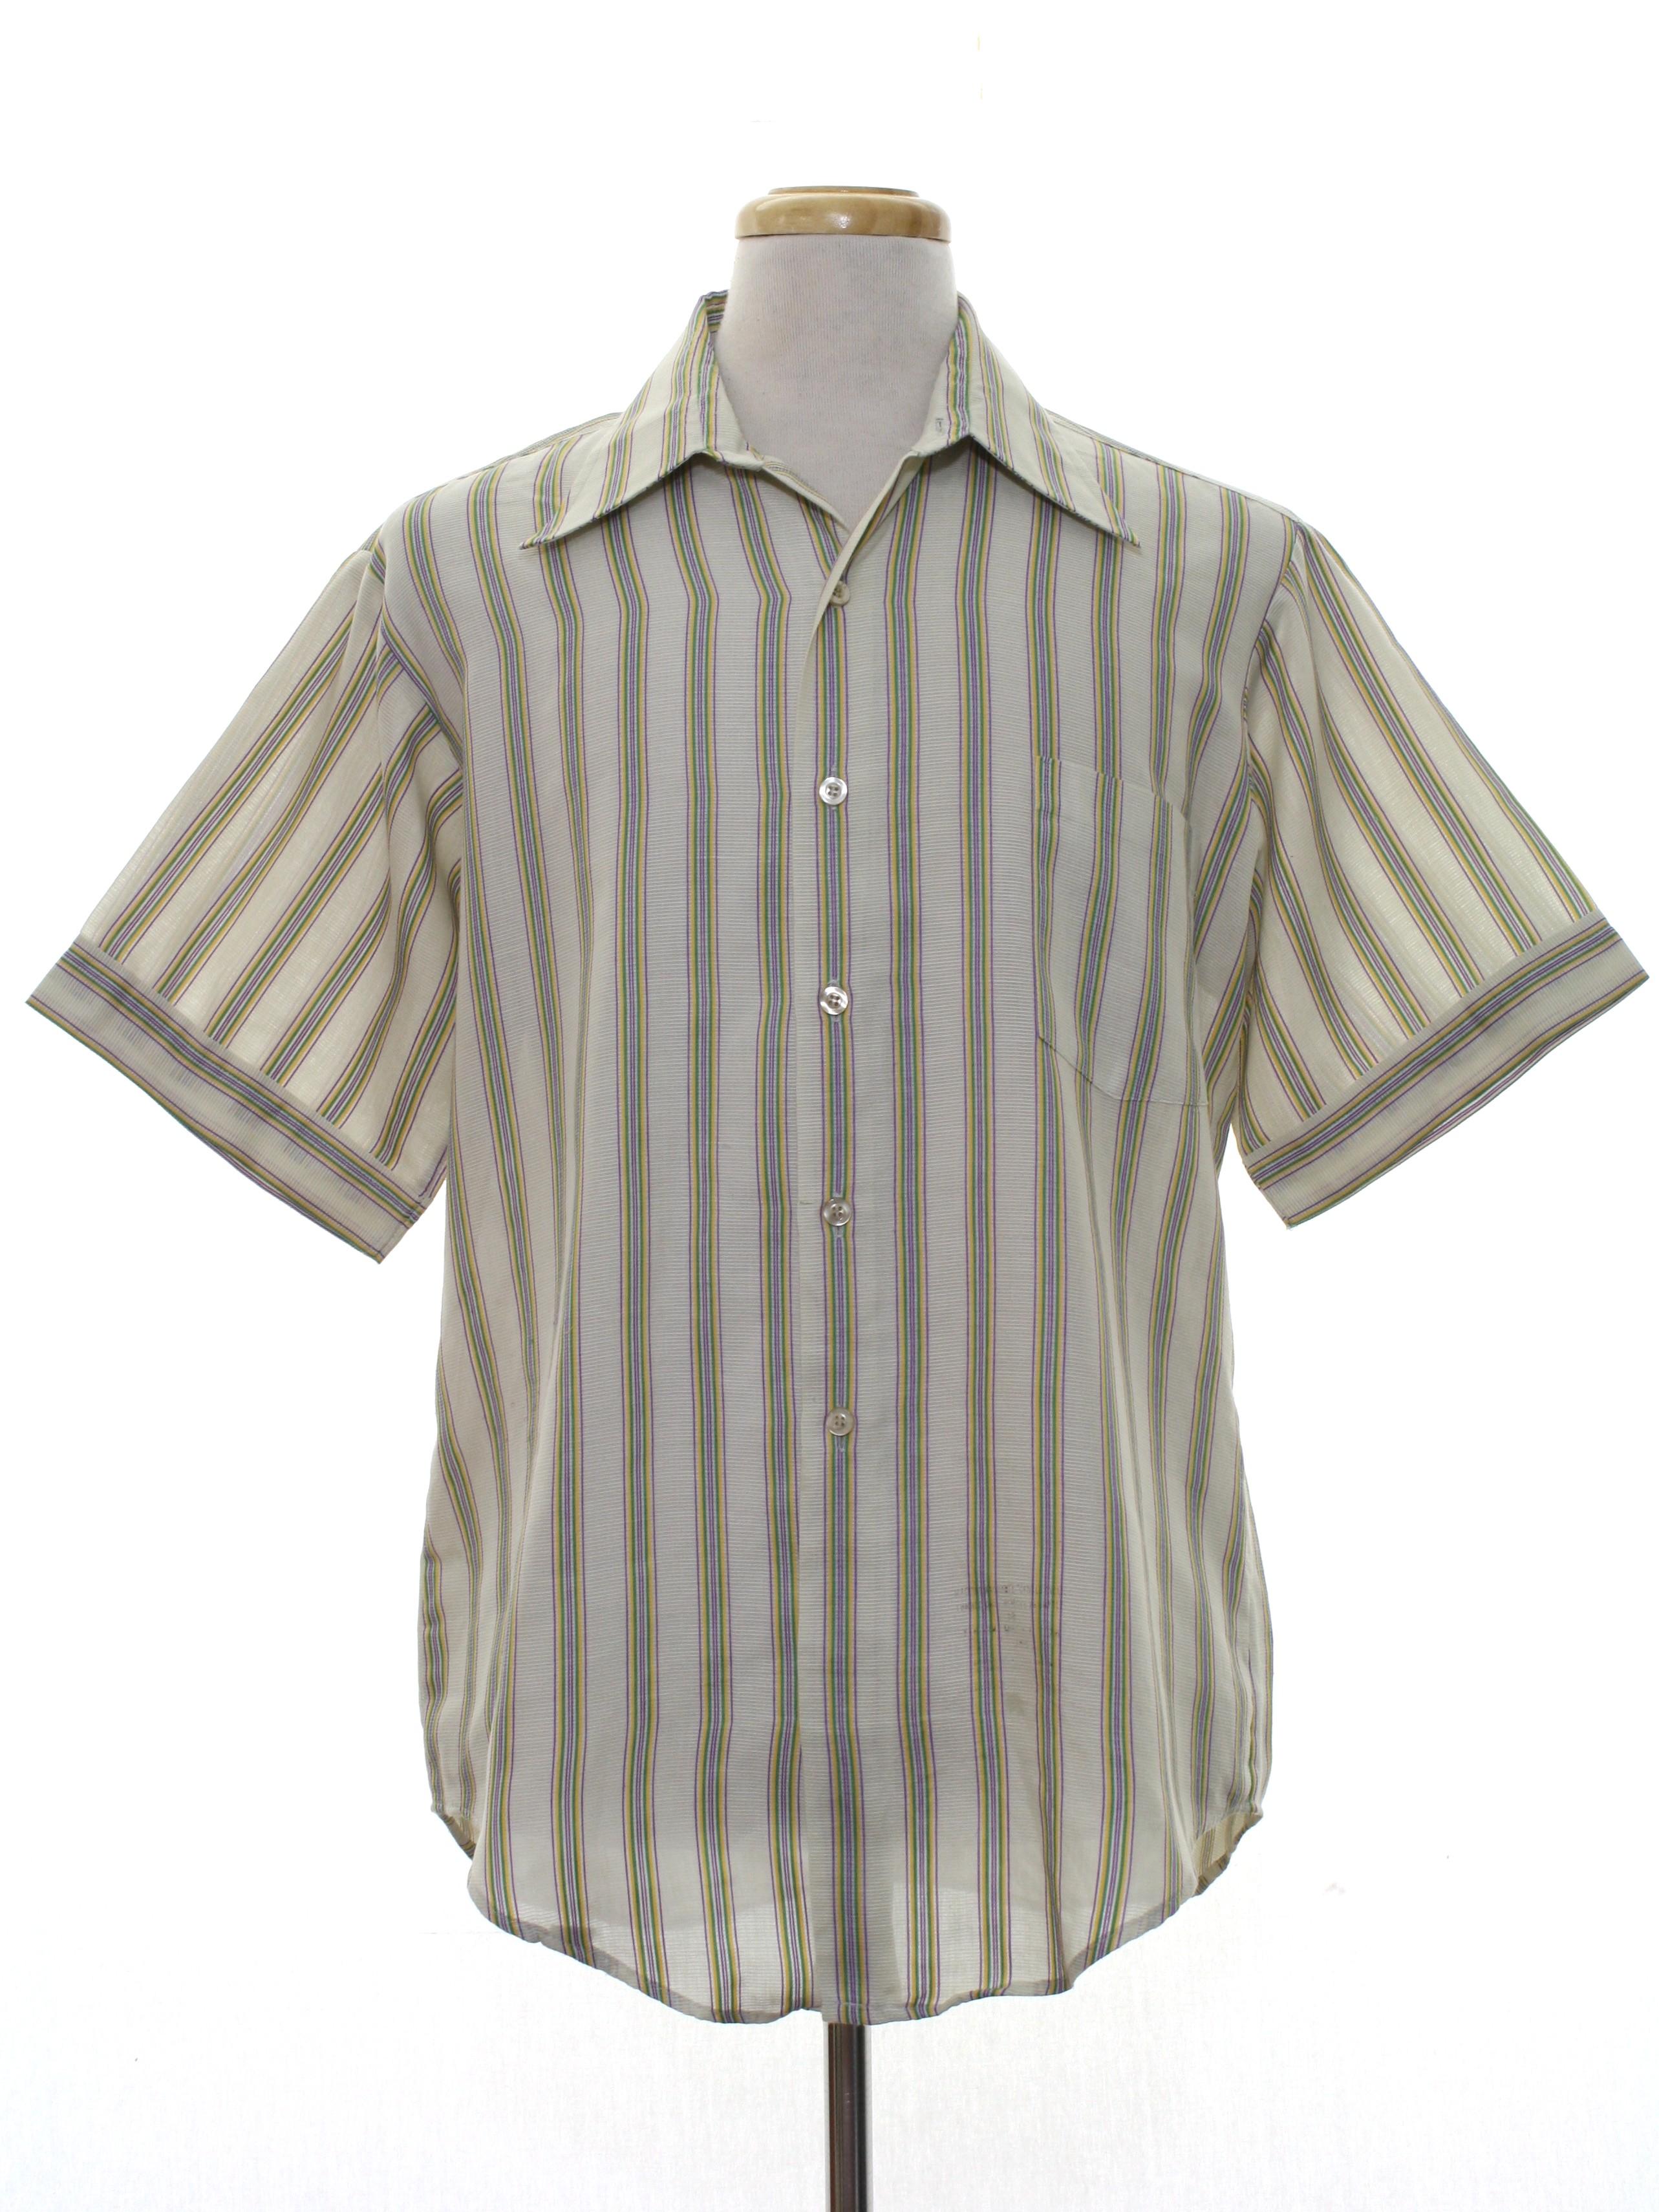 6a1509513188a 70s Retro Shirt  70s -Van Heusen- Mens pale grey background ...